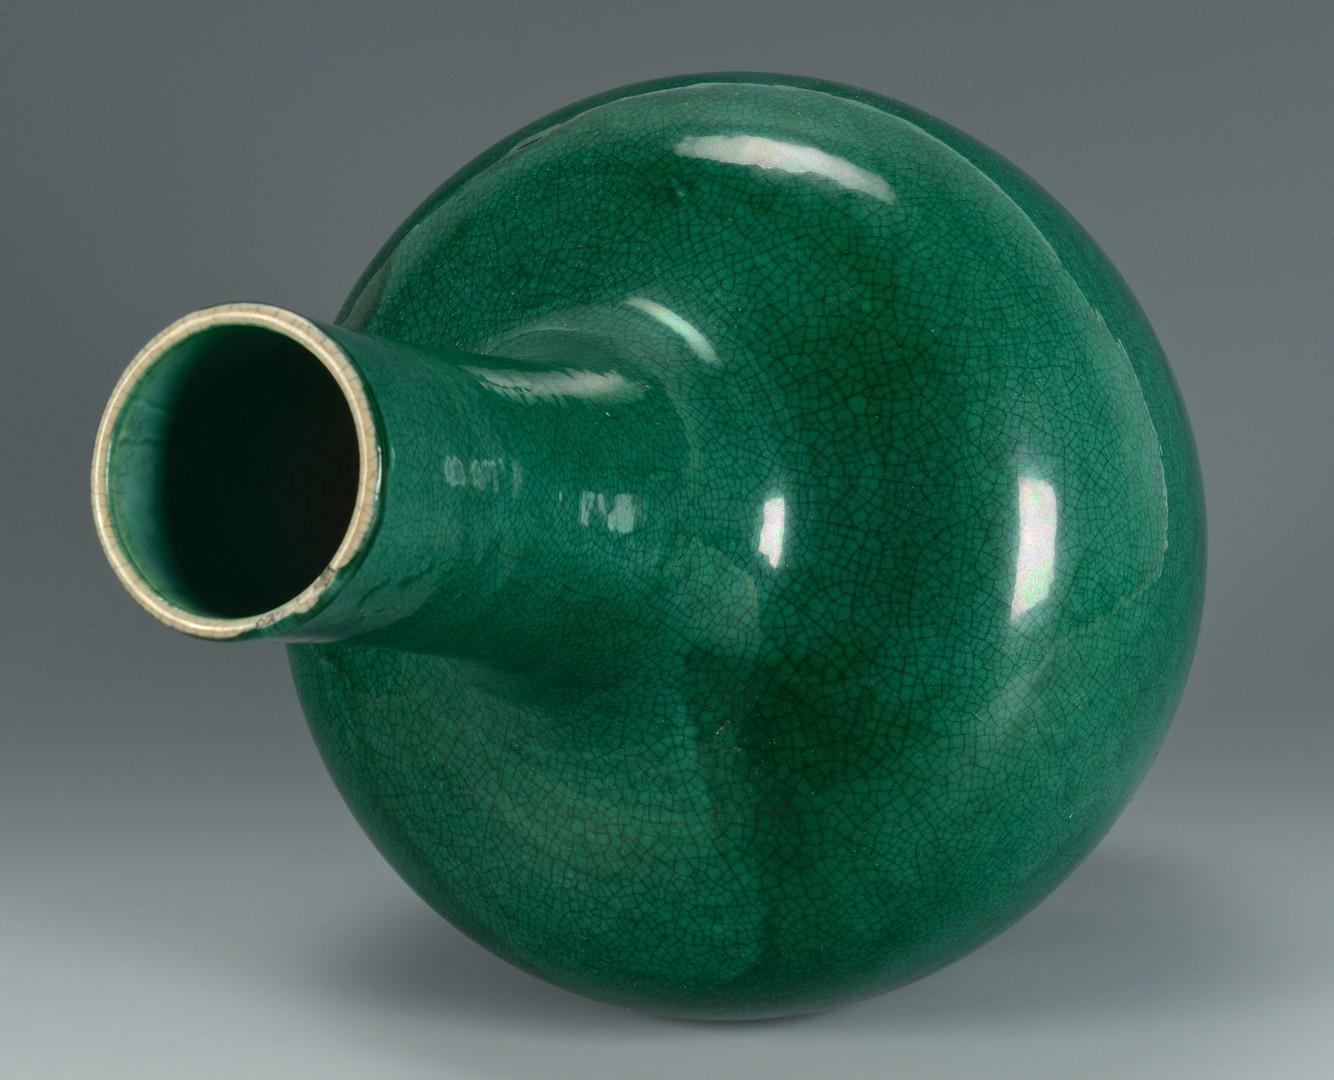 Lot 3383168: Large Chinese Green Porcelain Bottle Vase